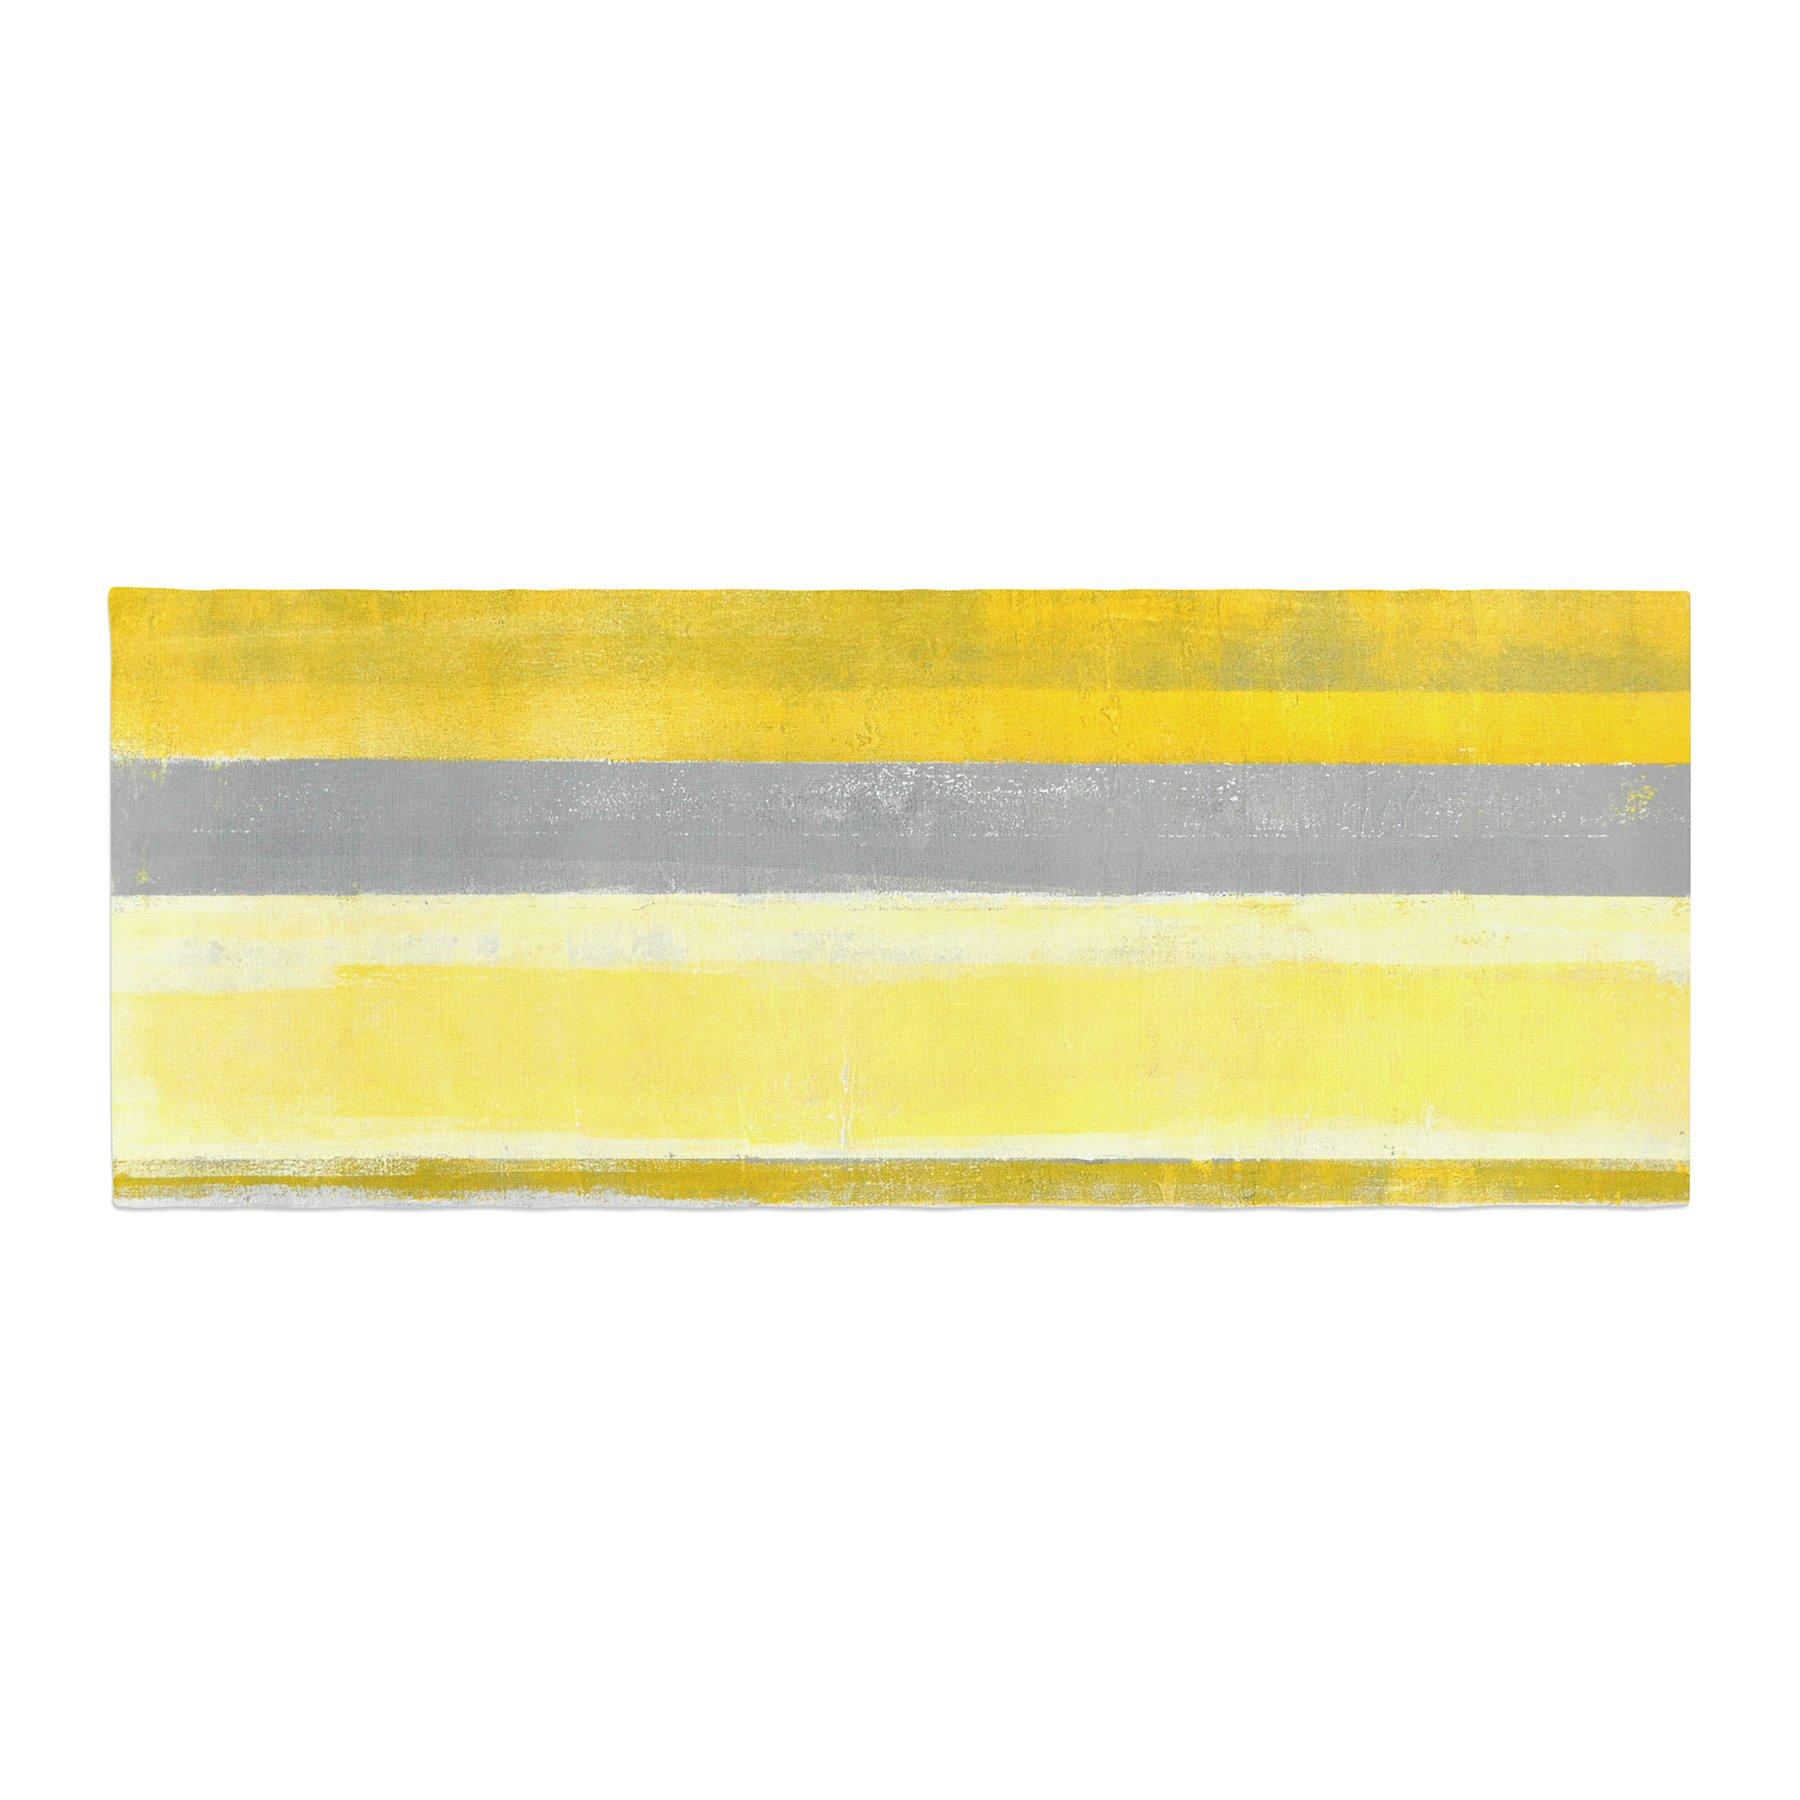 Kess InHouse CarolLynn Tice Lemon Yellow Gray Bed Runner, 34'' x 86''